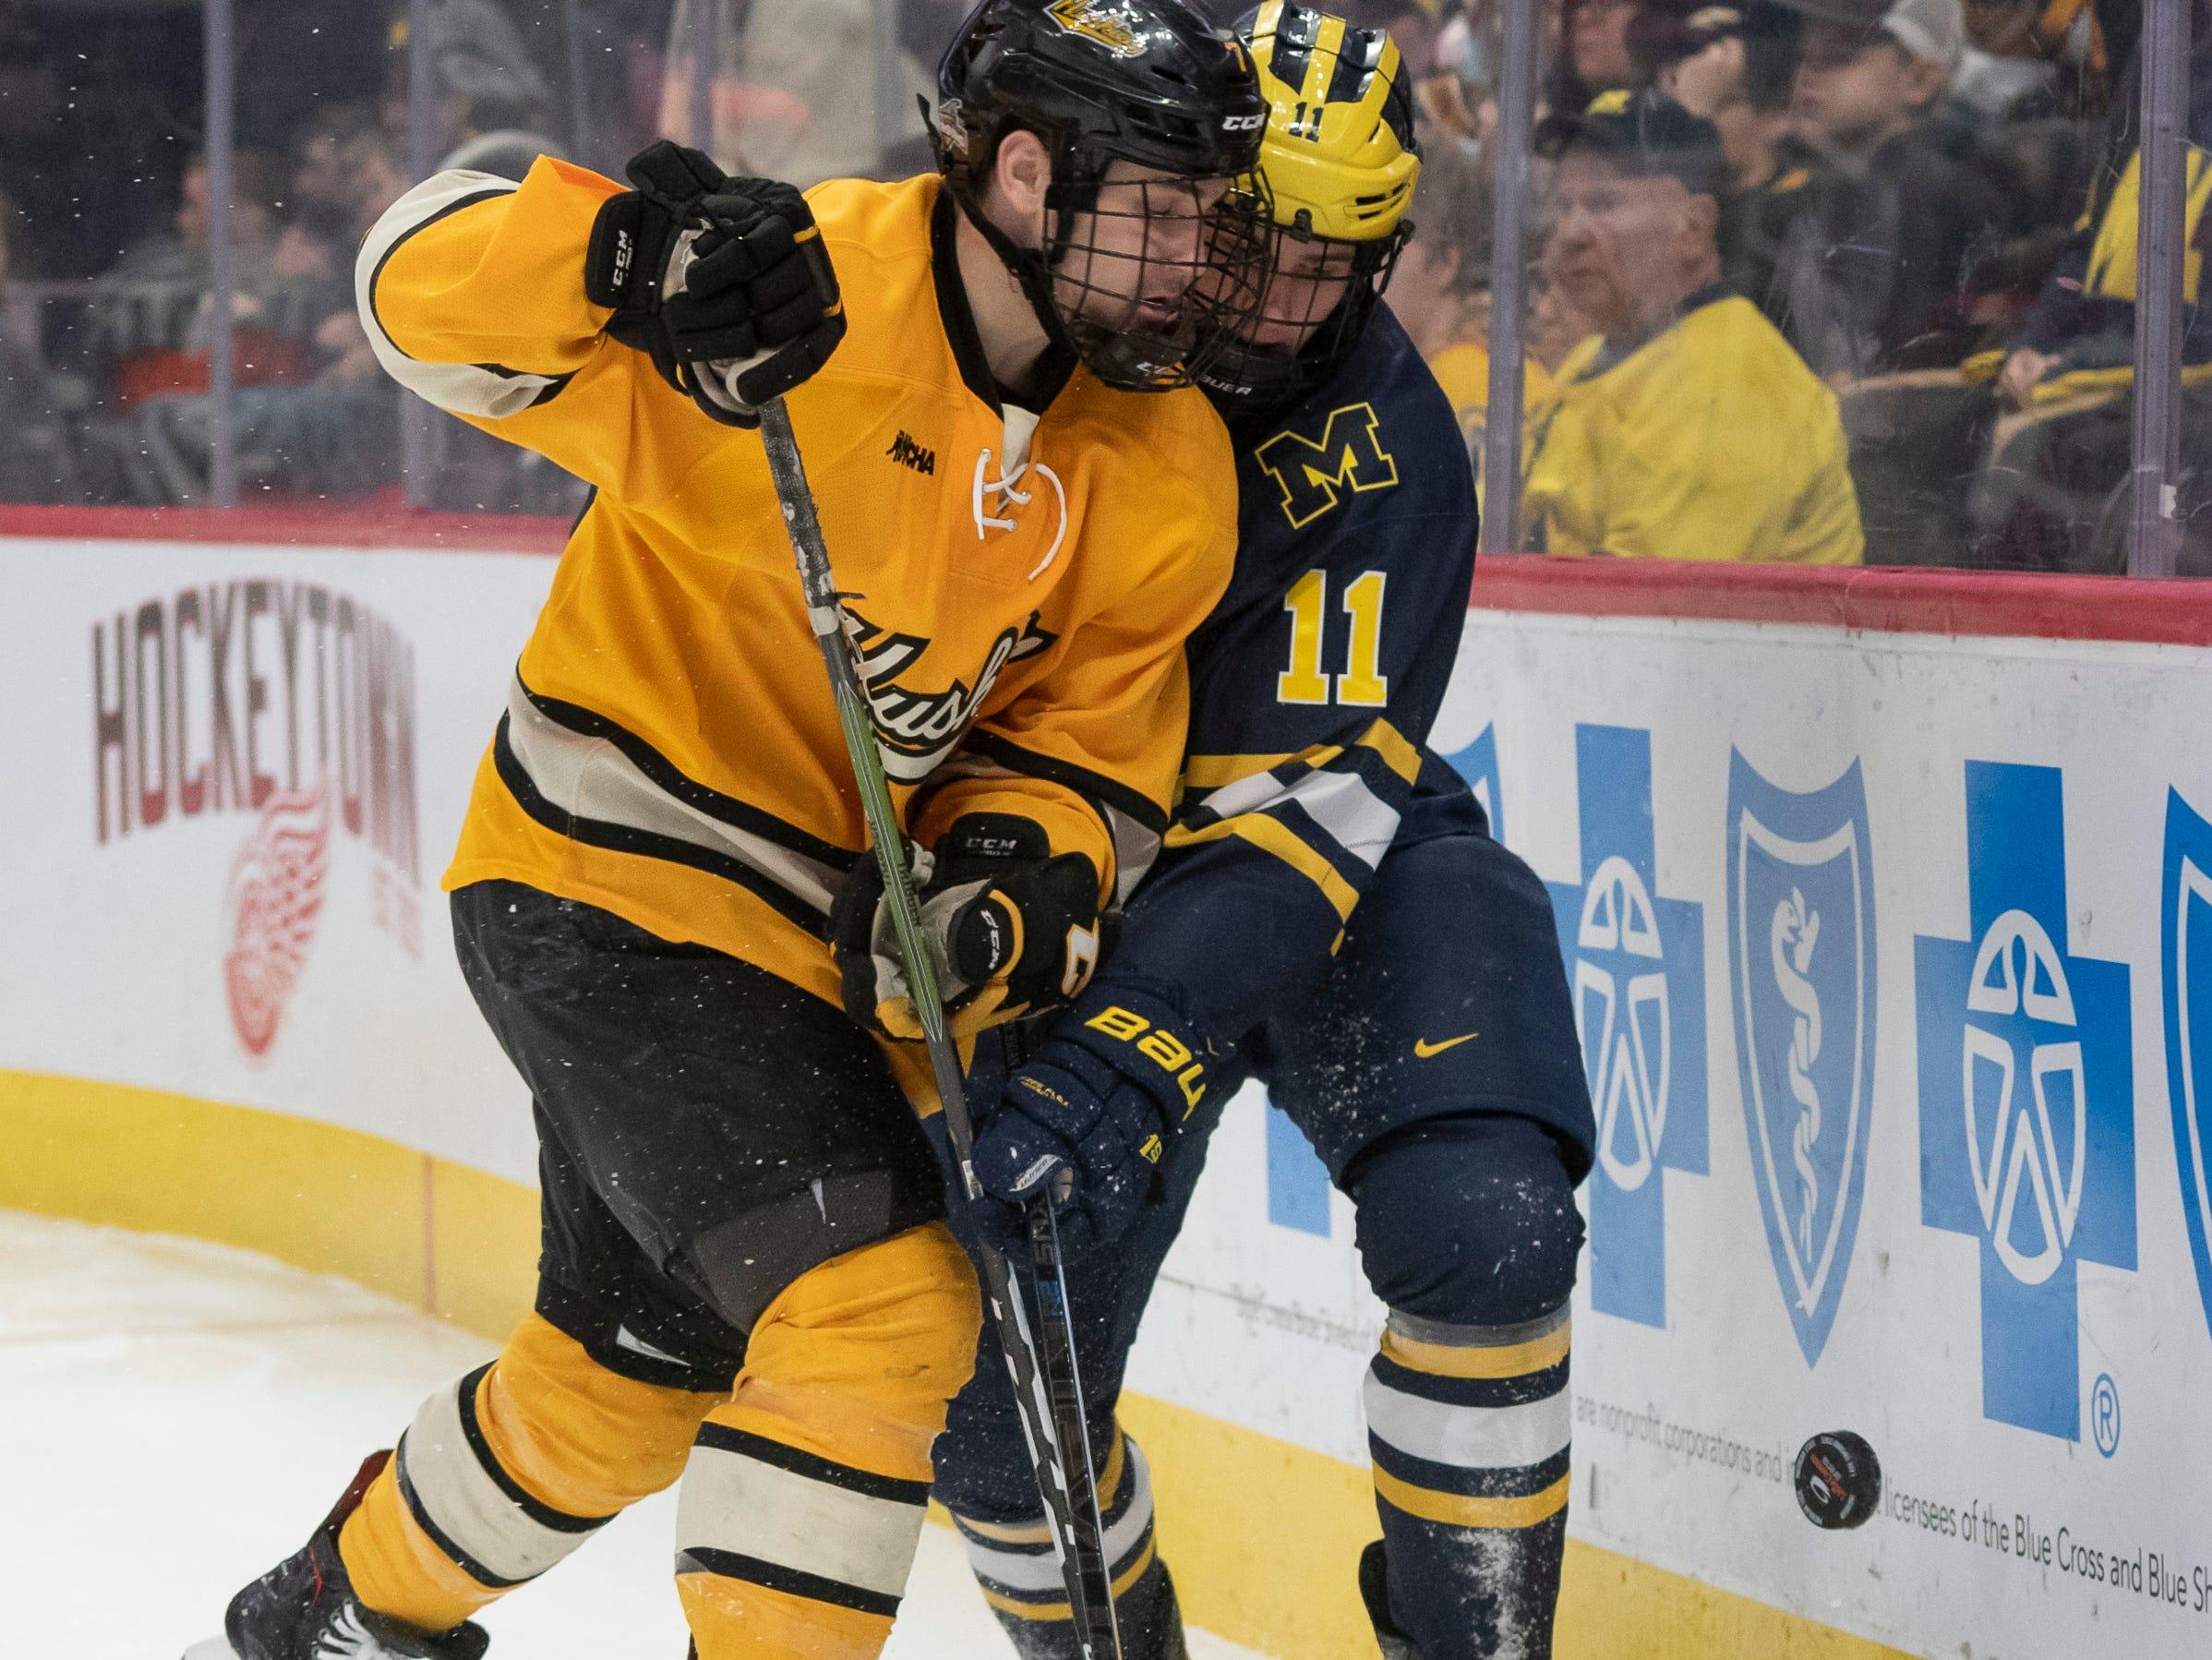 Michigan Tech defenseman Keegan Ford and Michigan forward Brendan Warren battle for the puck in the second period.